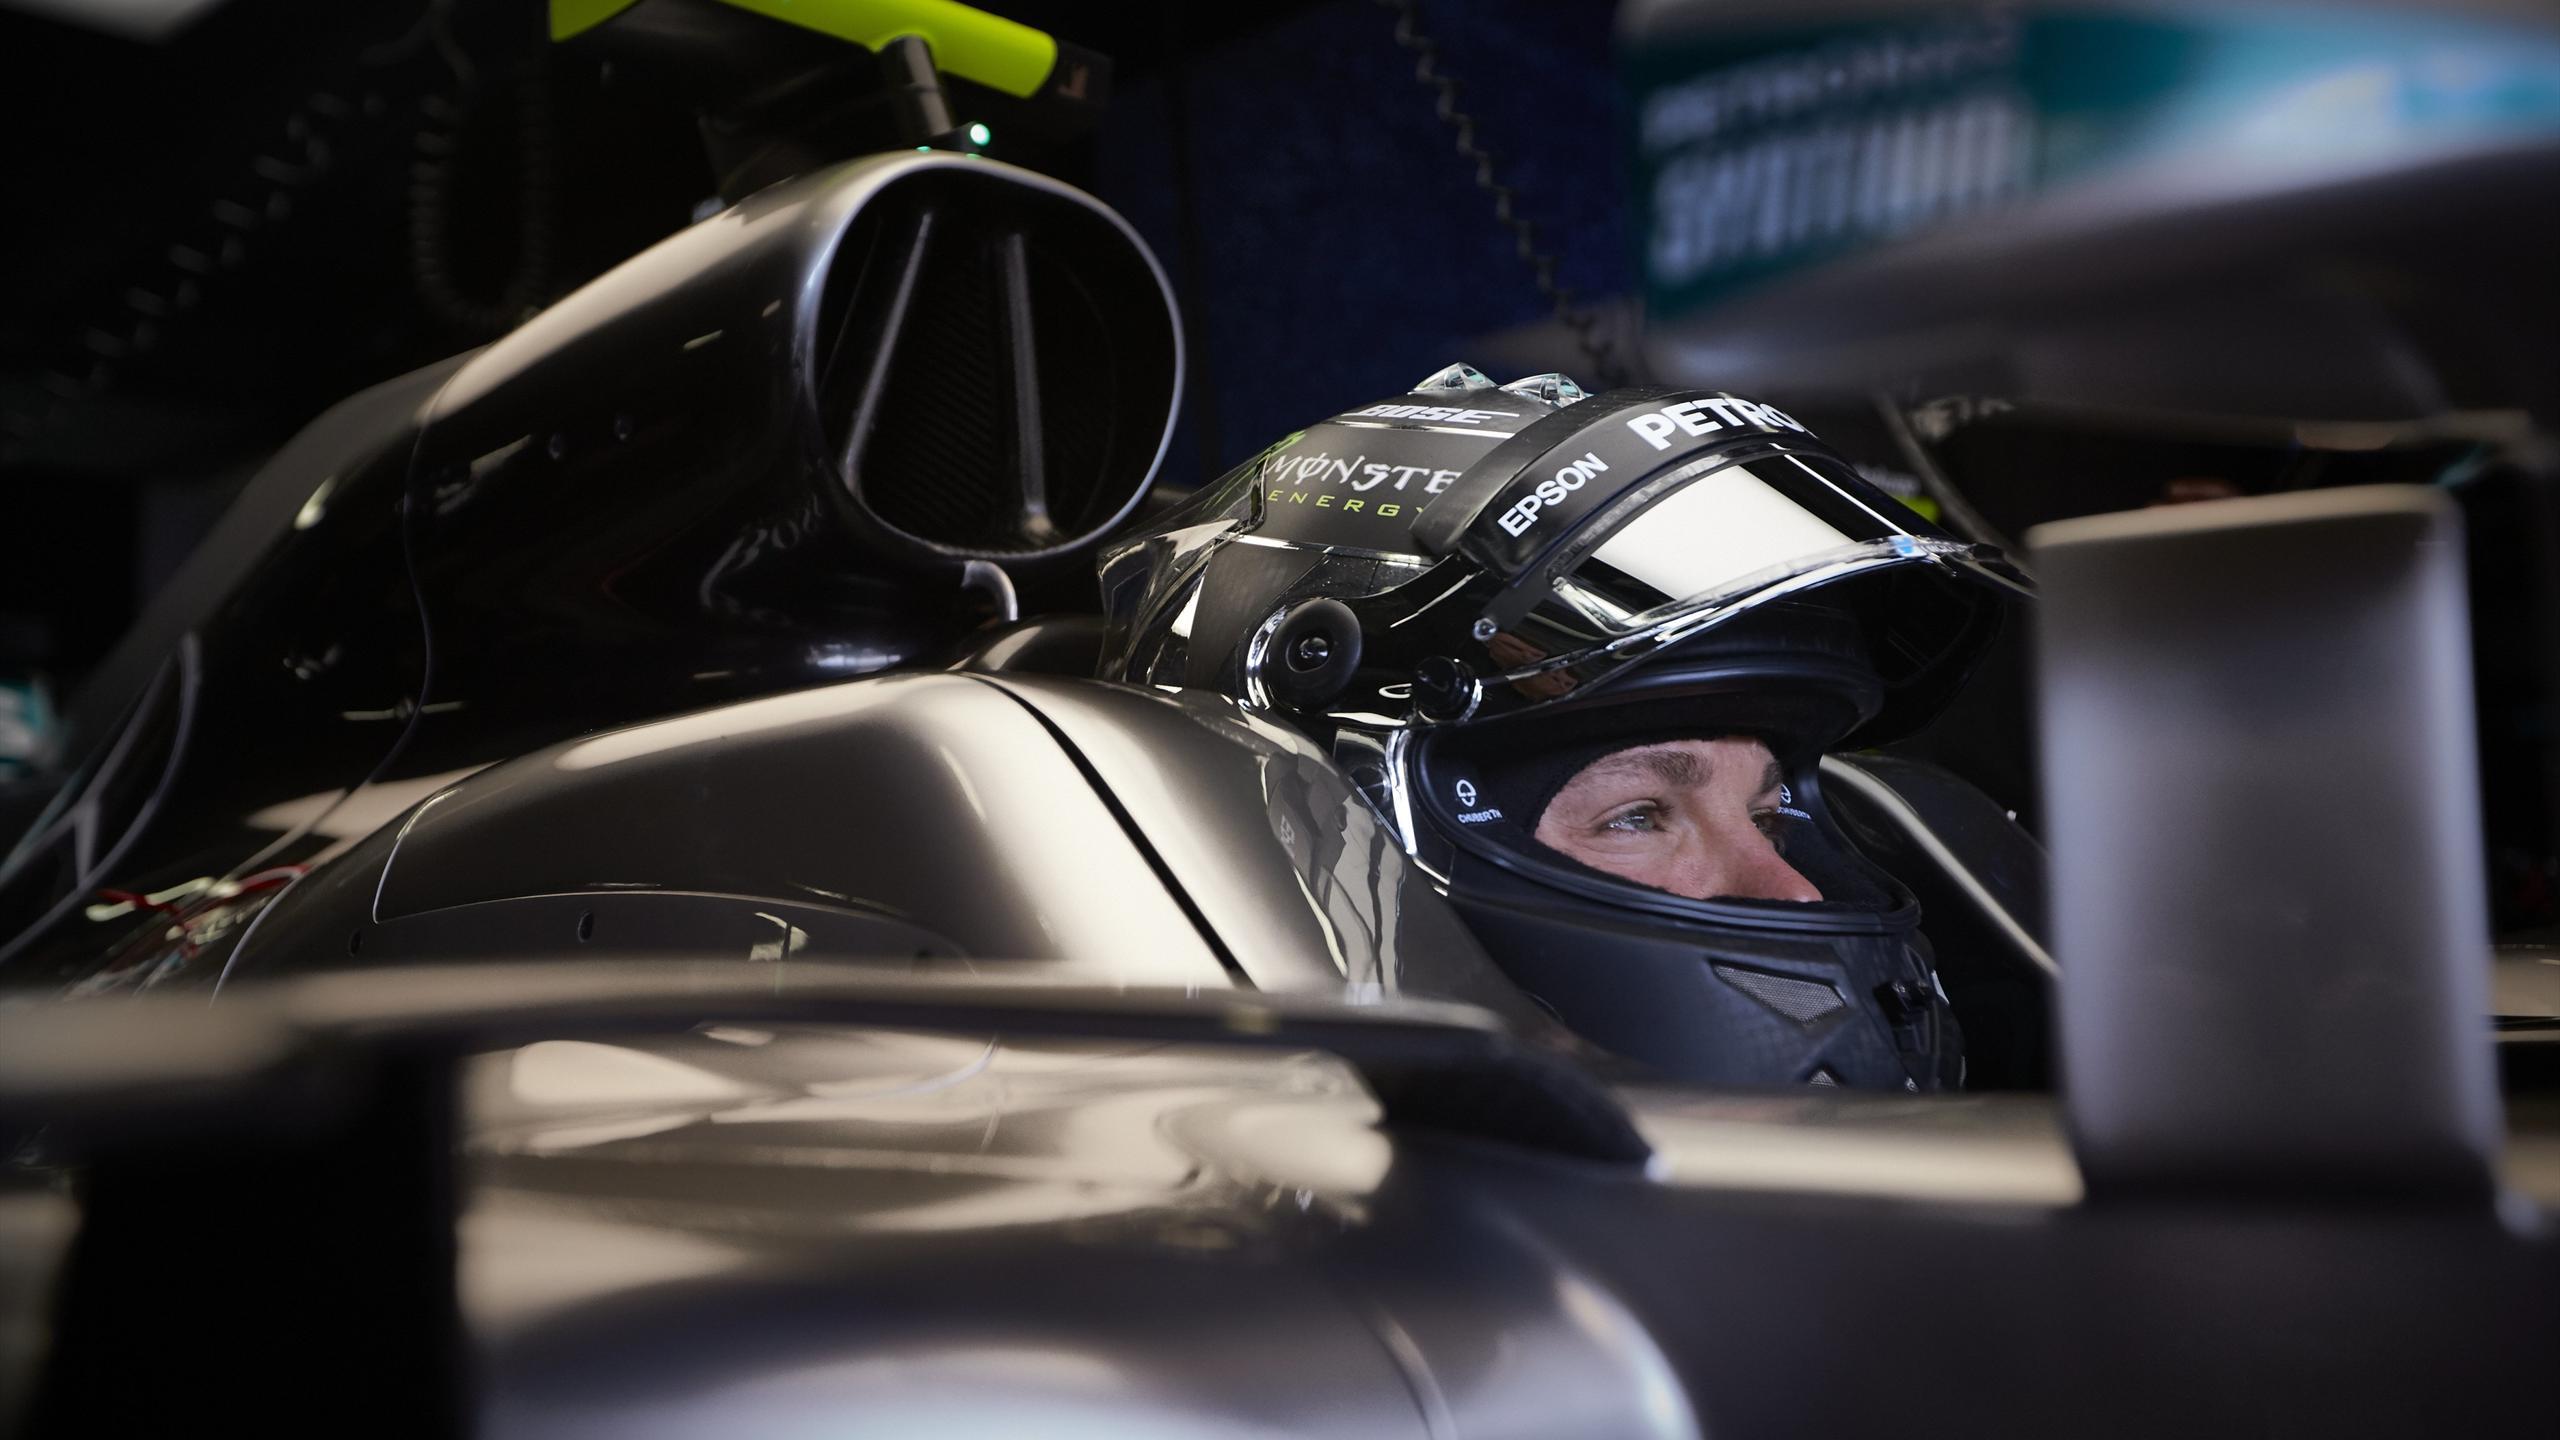 Nico Rosberg (Mercedes) au Grand Prix de Monaco 2016